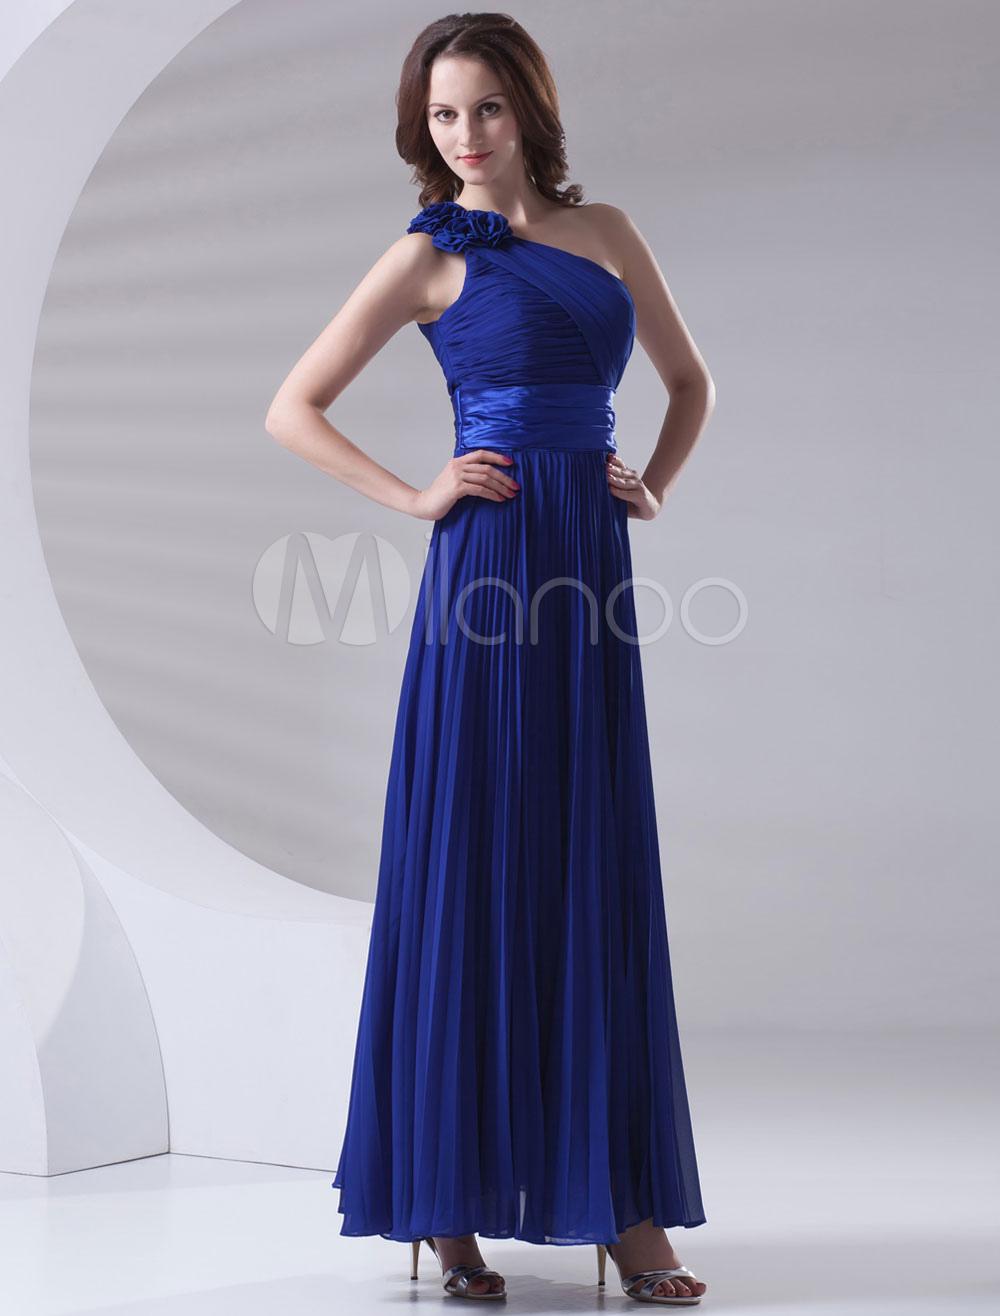 Maxi Bridesmaid Dress Blue One-shoulder Ankle-length Pleated Chiffon Wedding Party Dress (Bridesmaid Dresses) photo